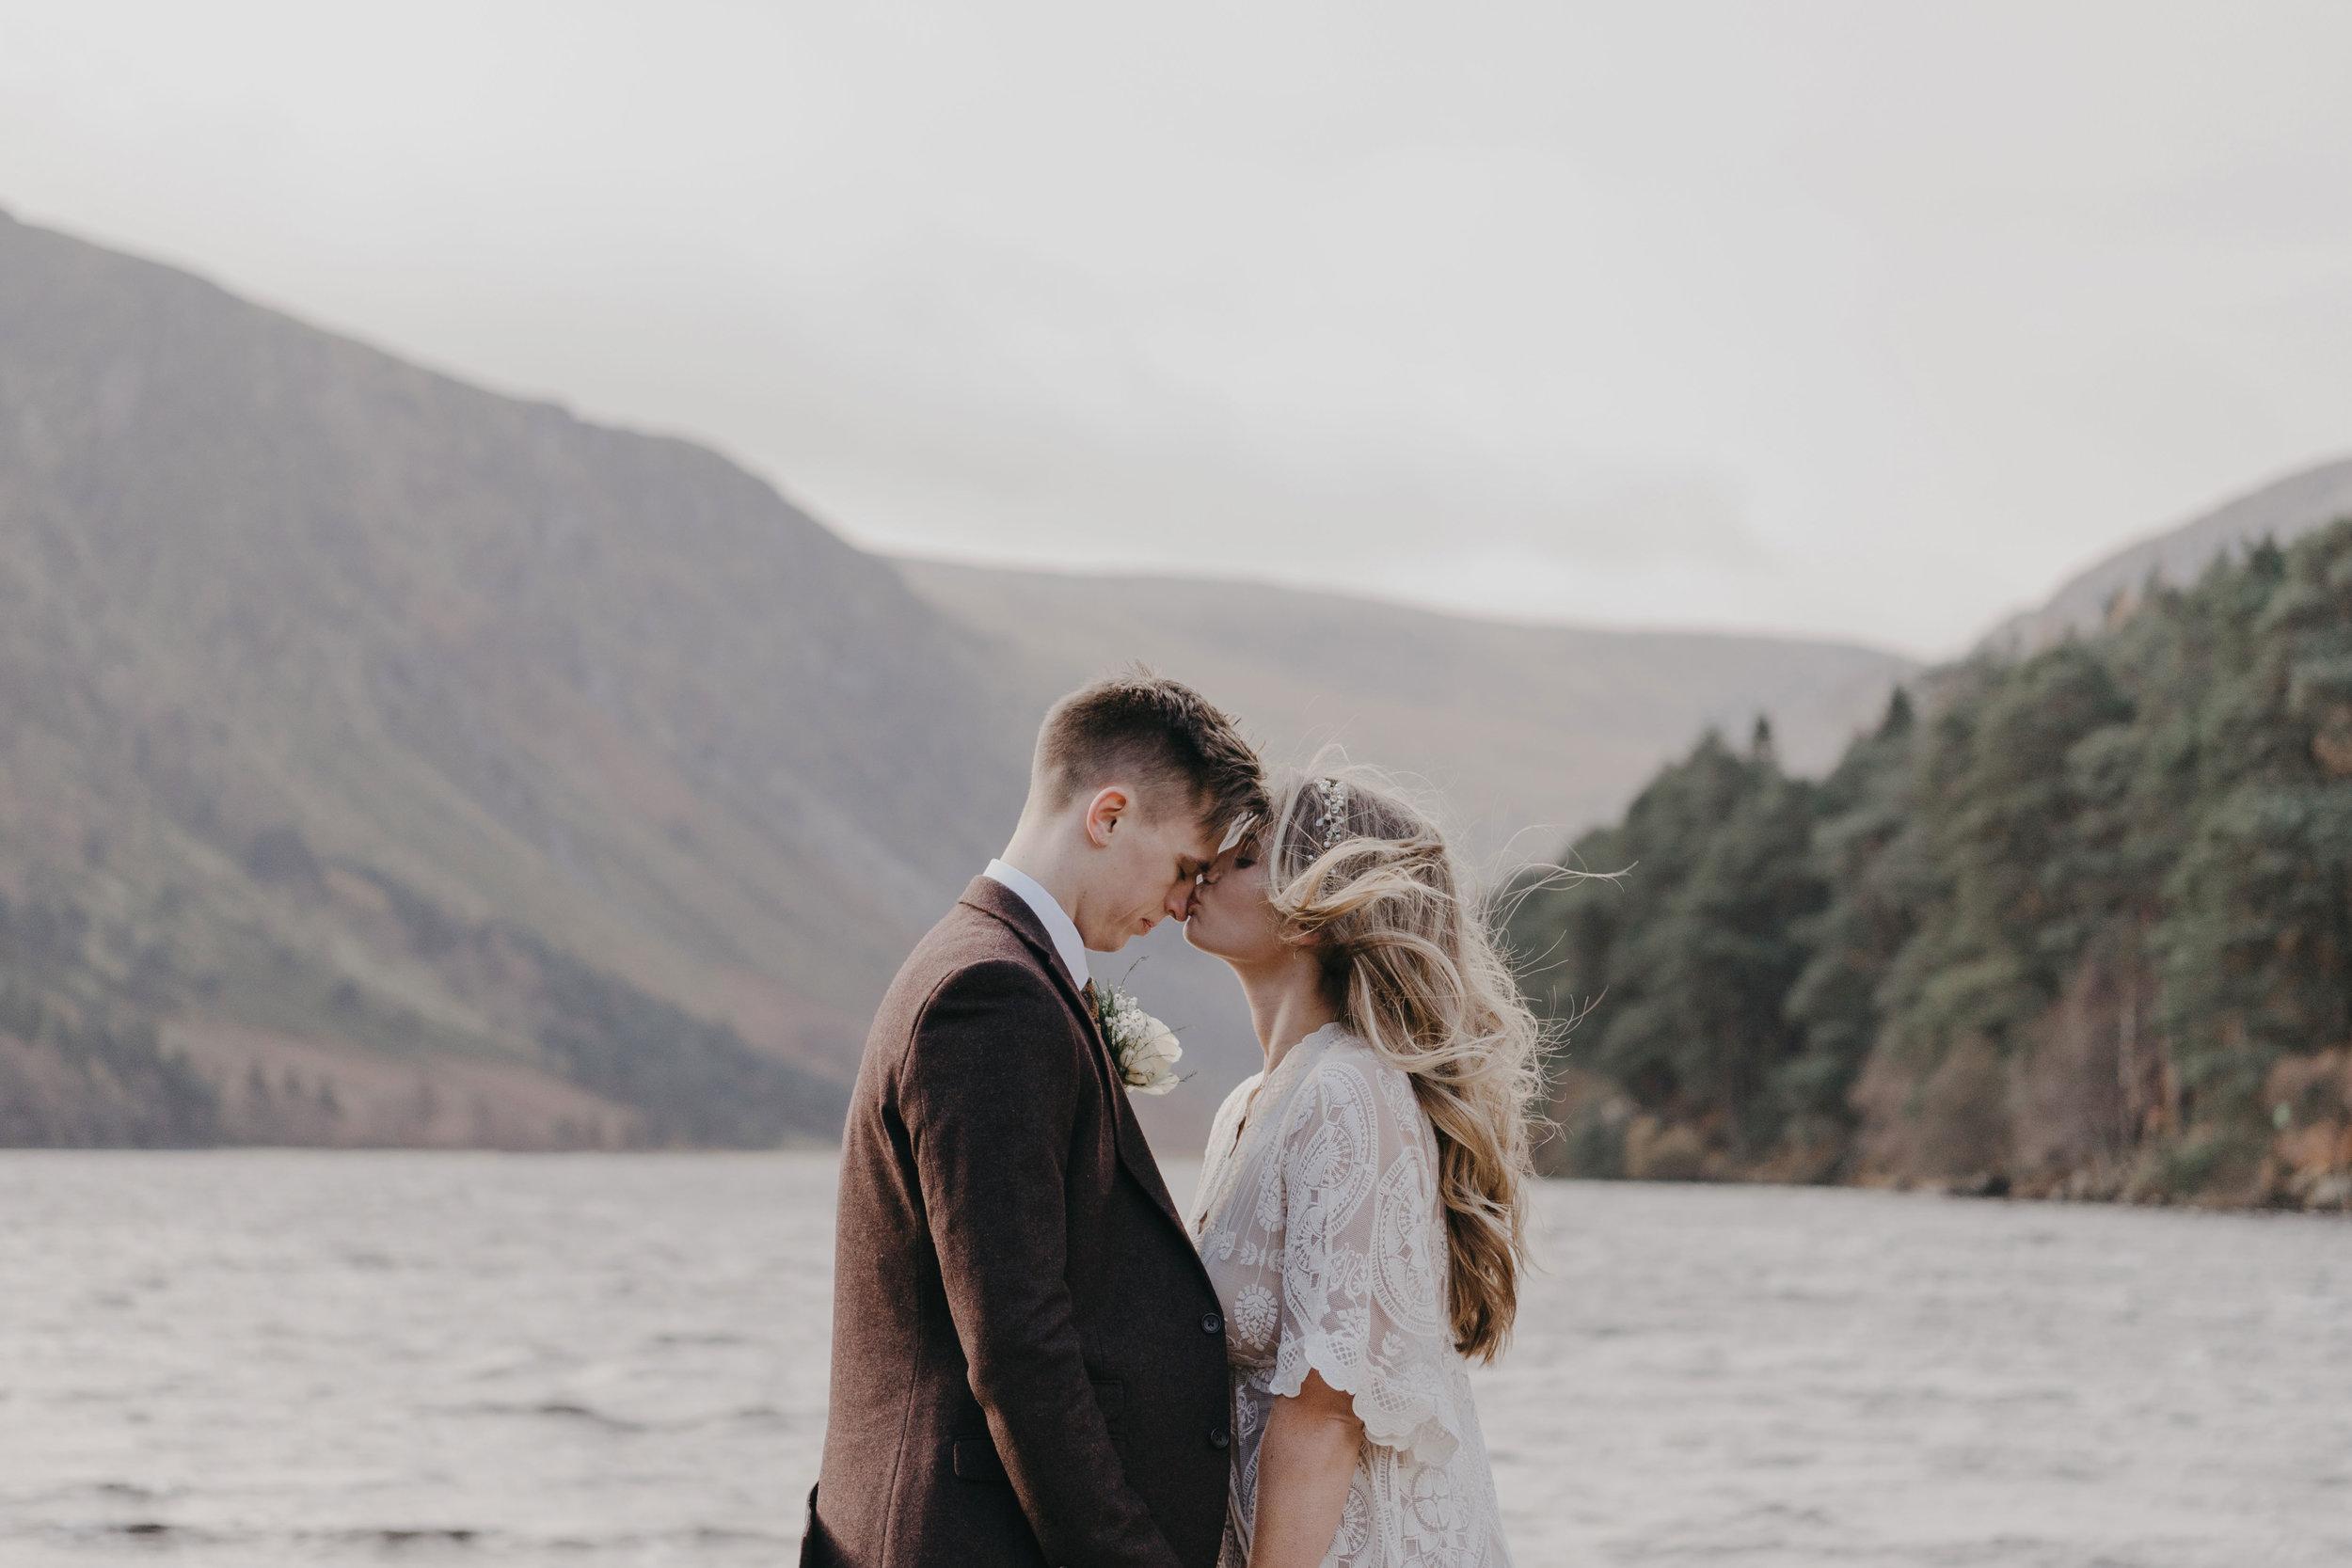 destination-wedding-photographer-035.jpg